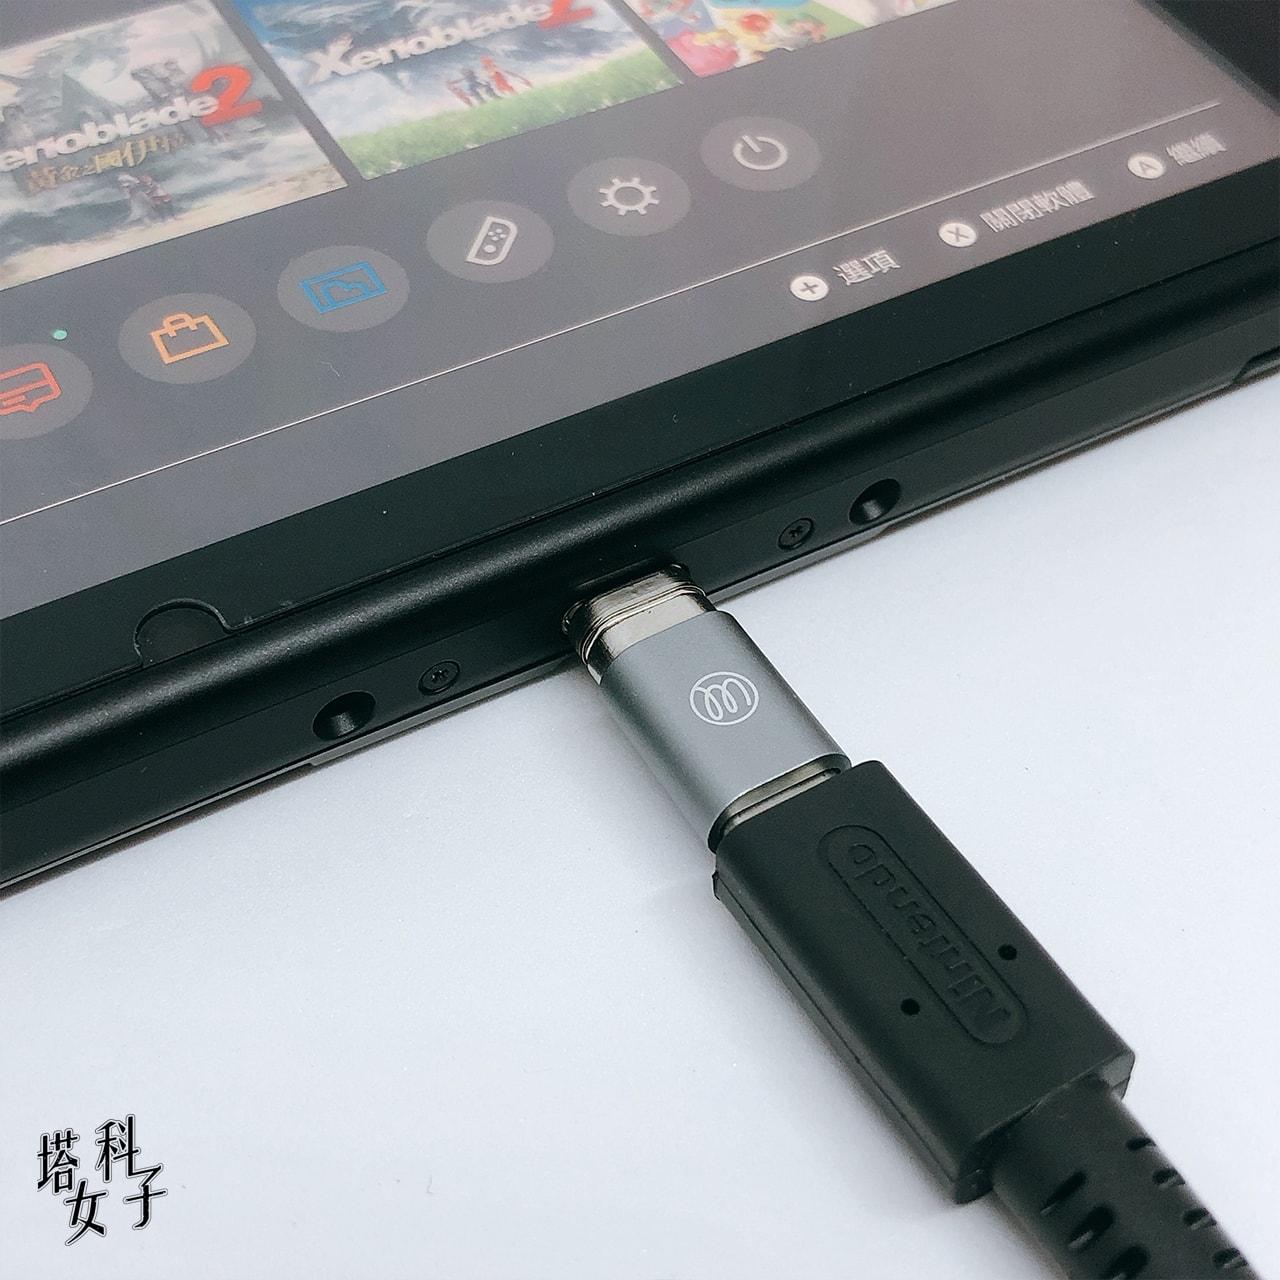 iEasy USB-C 磁吸轉接頭 - Switch